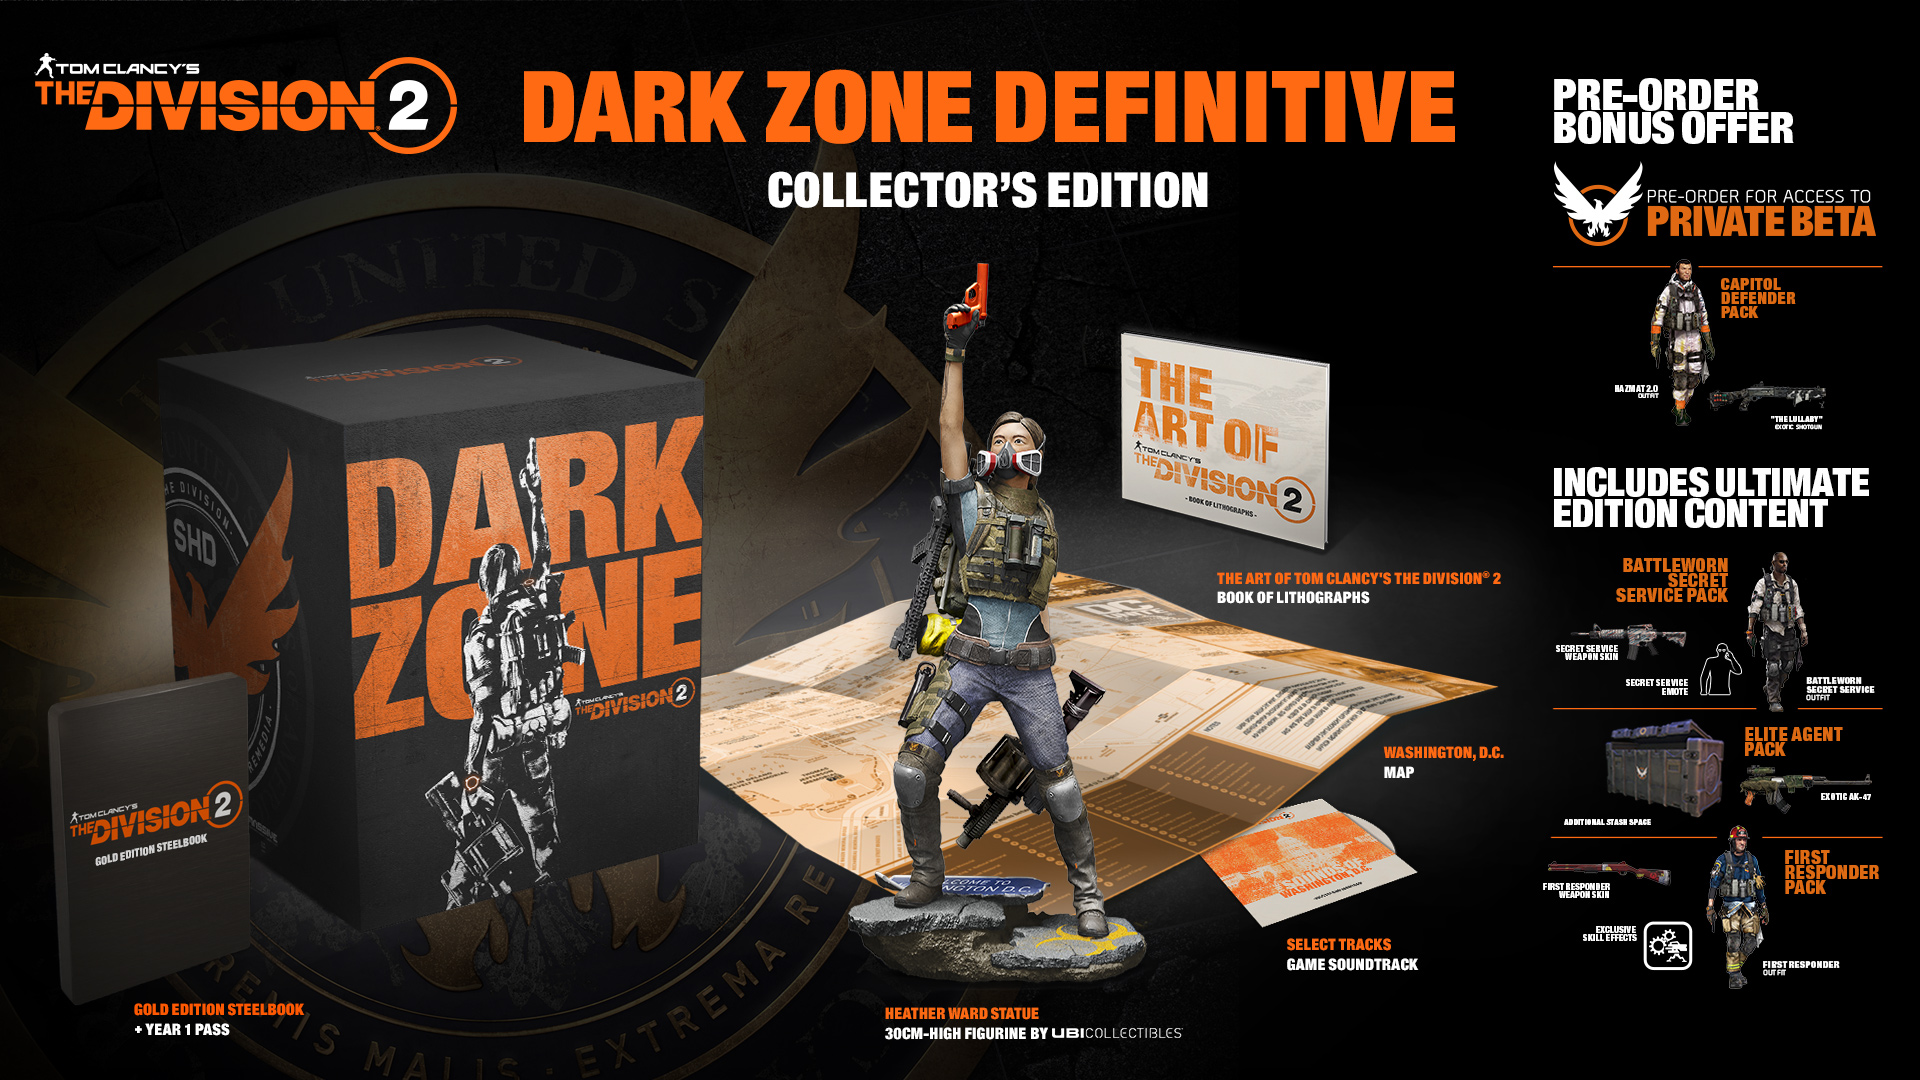 TCTD2_DarkZone_Content.jpg